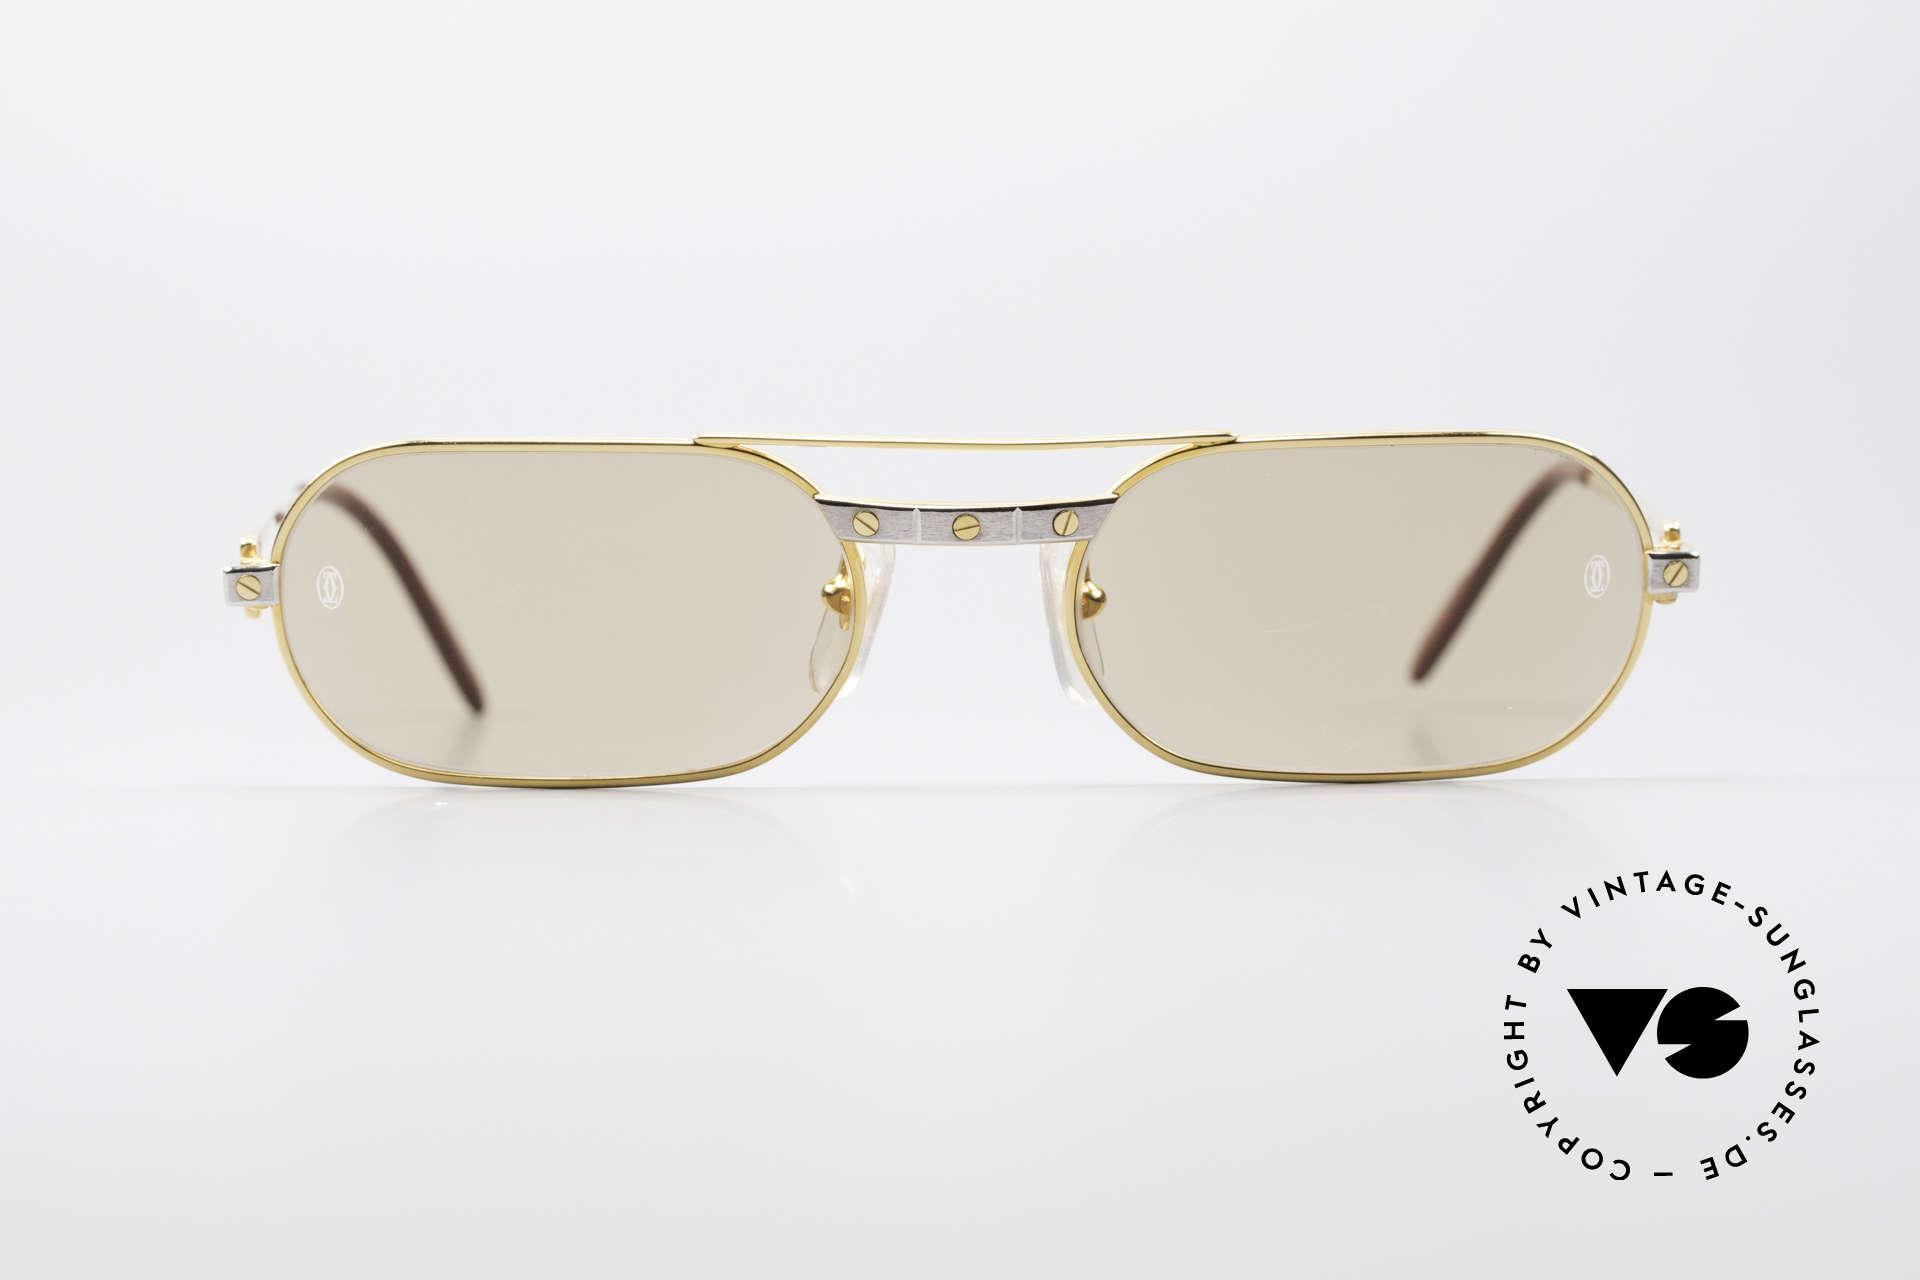 e88c360d13a Sunglasses Cartier MUST Santos - M Elton John Shades